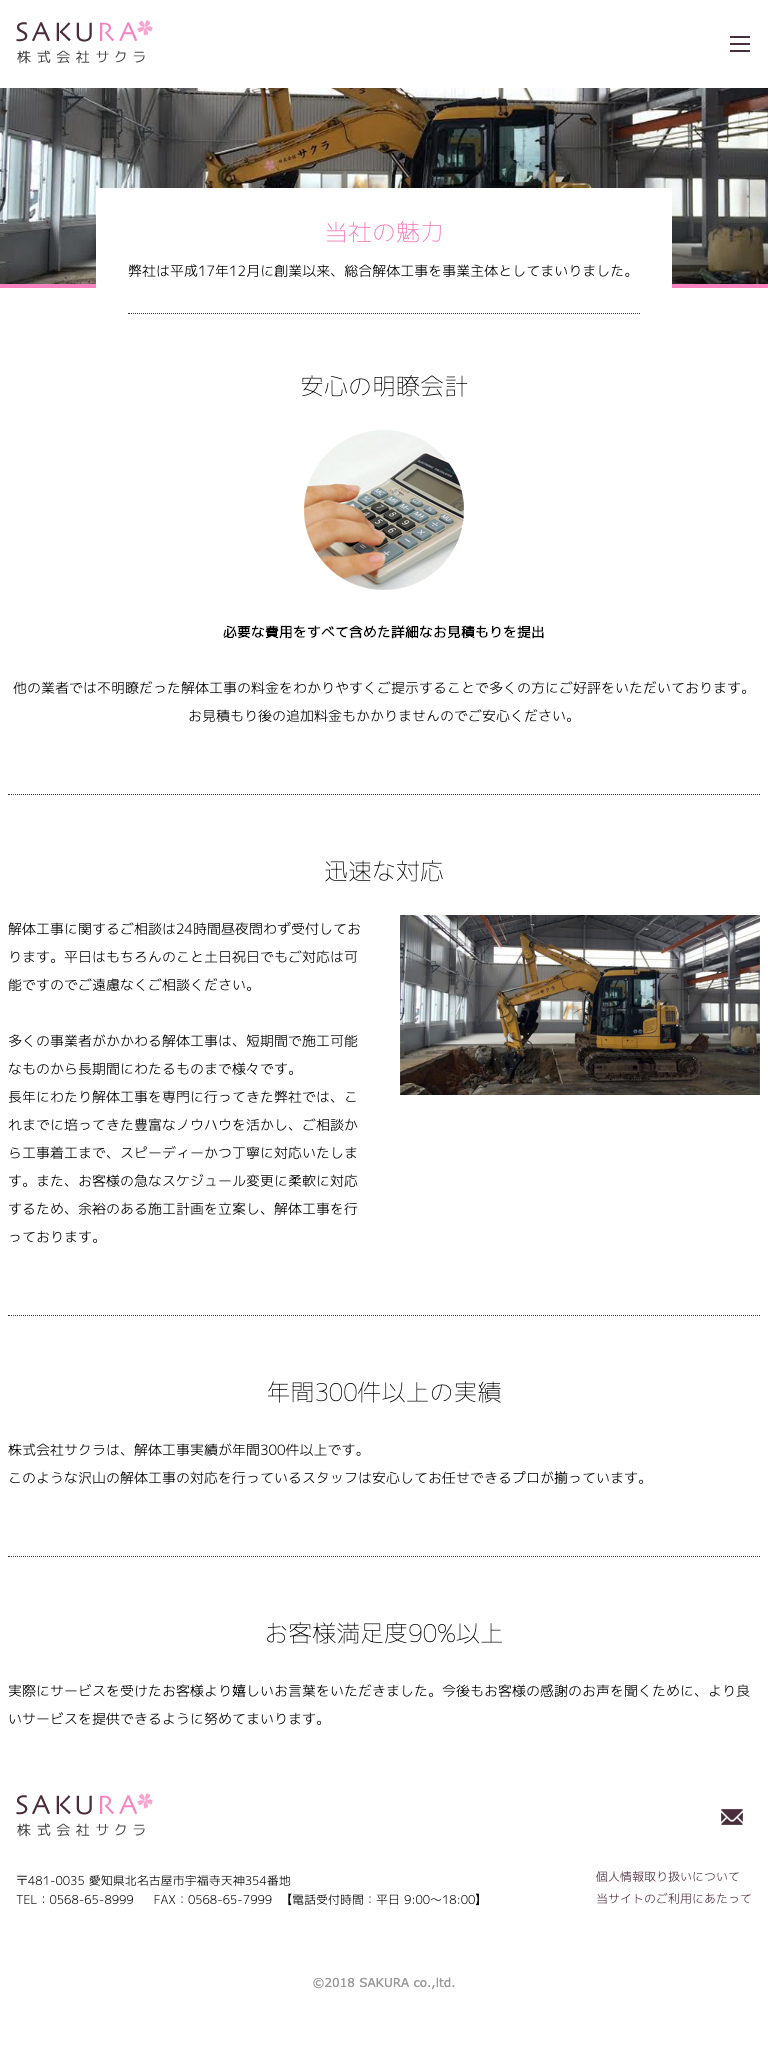 sakura-kaitai_f.jpg